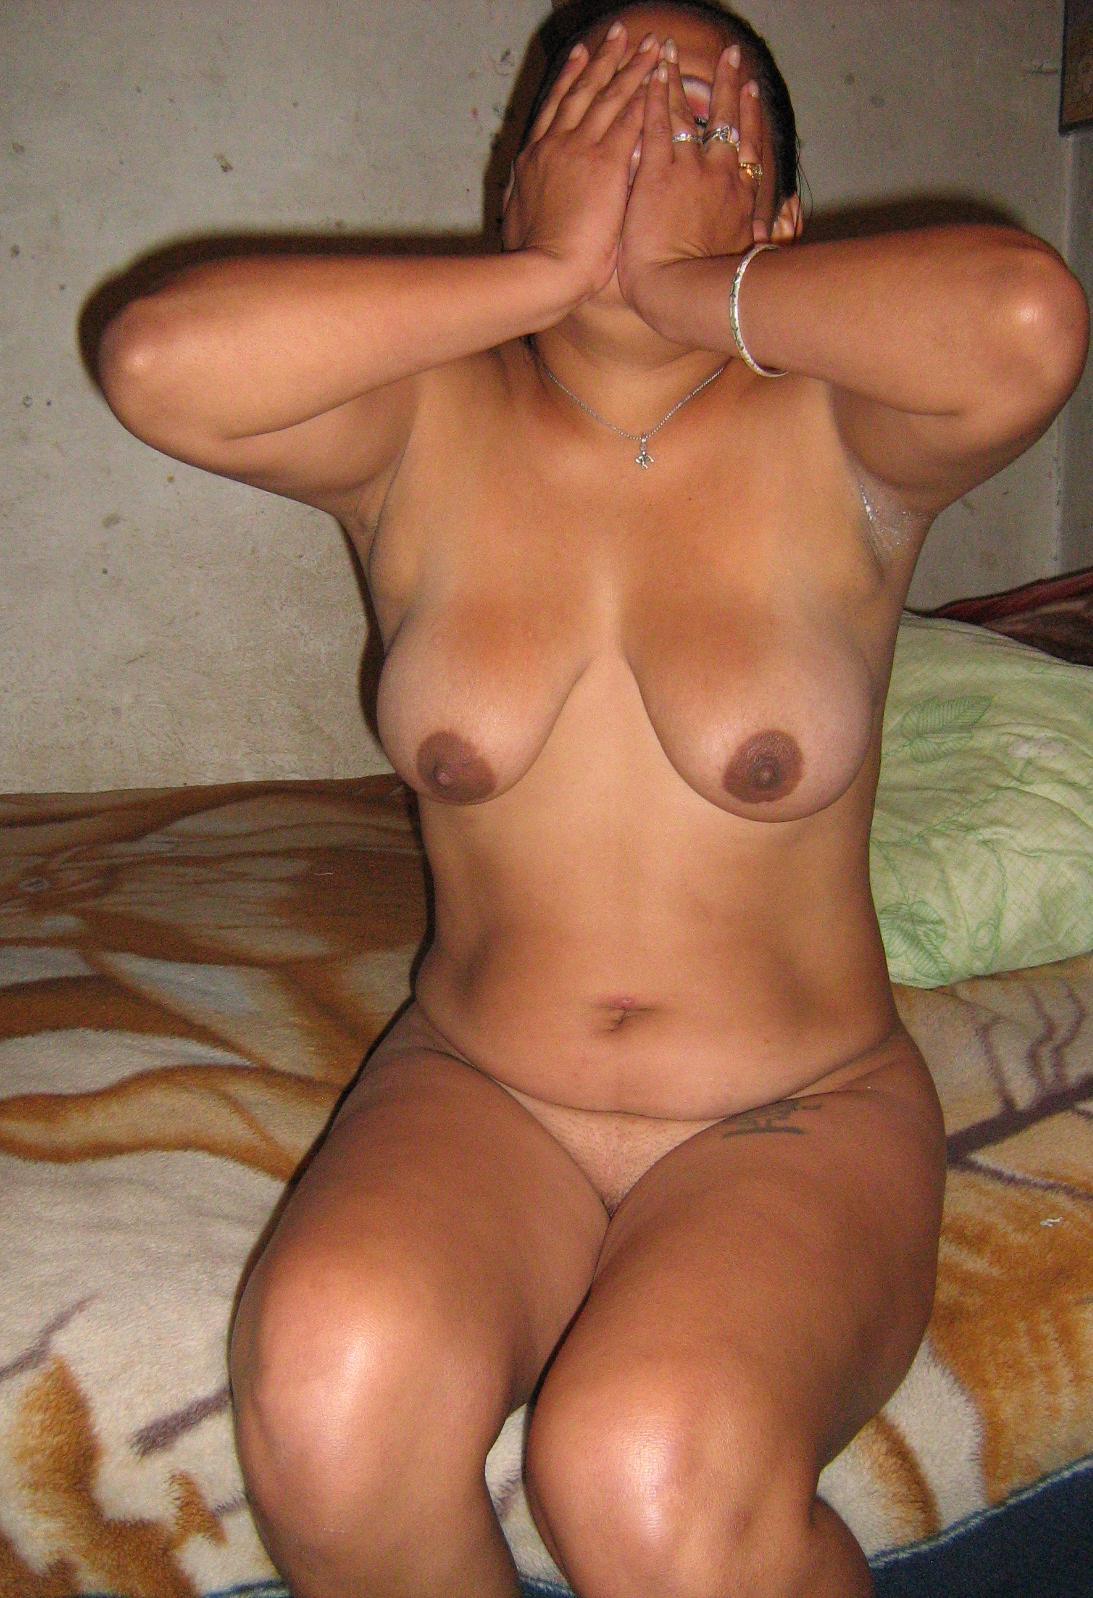 Chicas Calientes De Guatemala